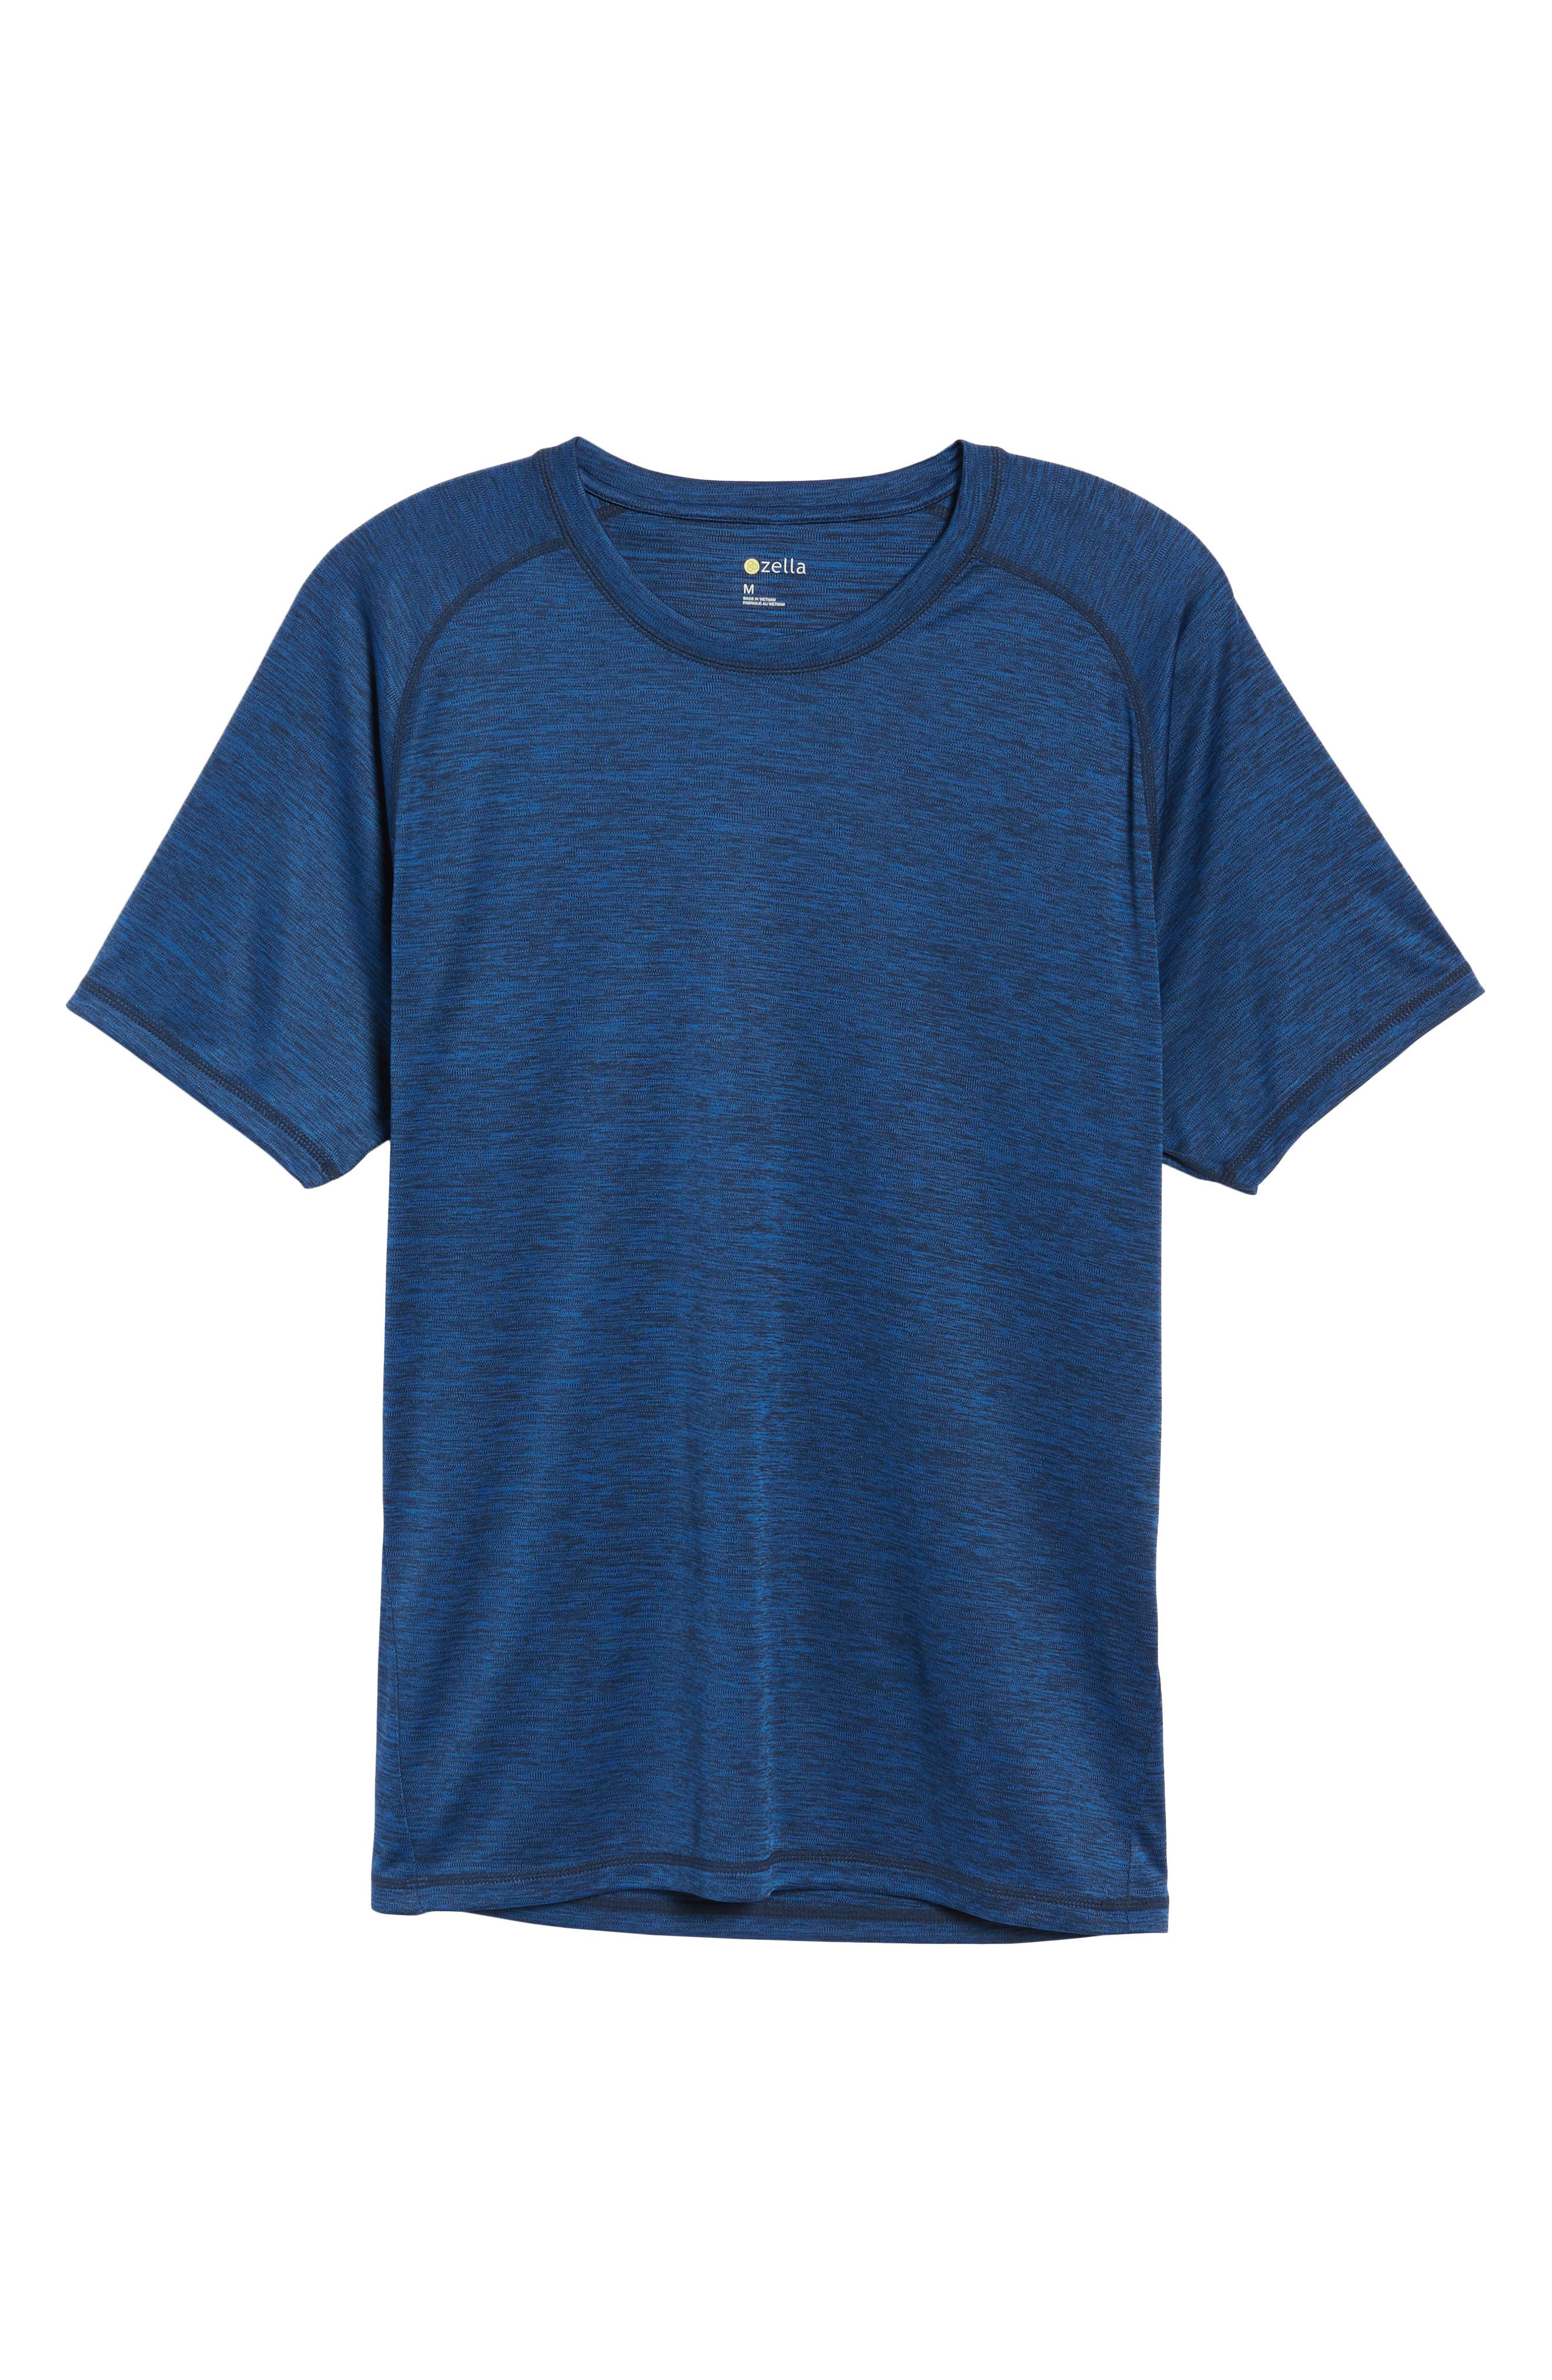 Triplite T-Shirt,                             Alternate thumbnail 68, color,